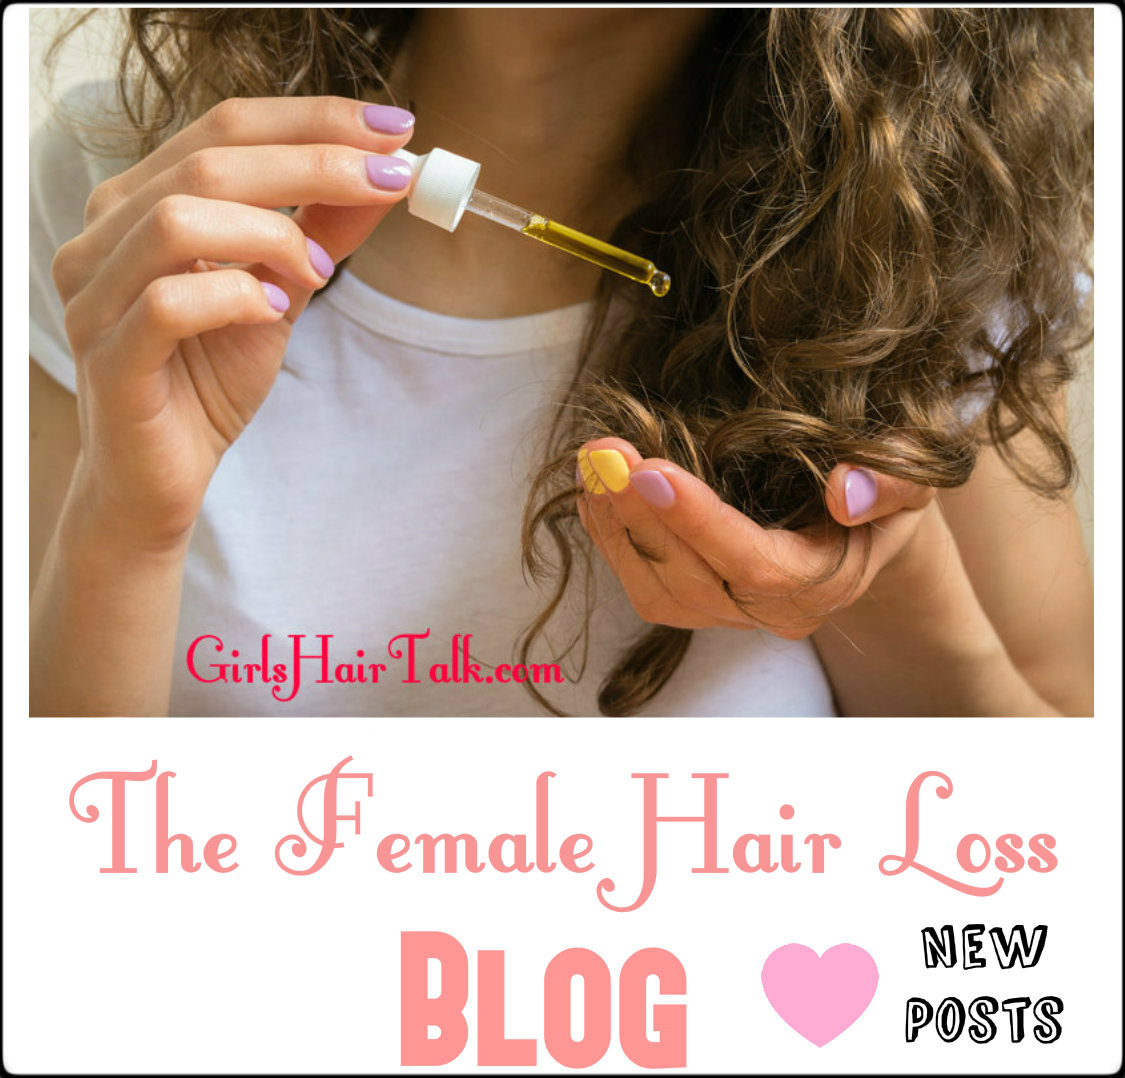 Women putting hair loss treatment on her hair.